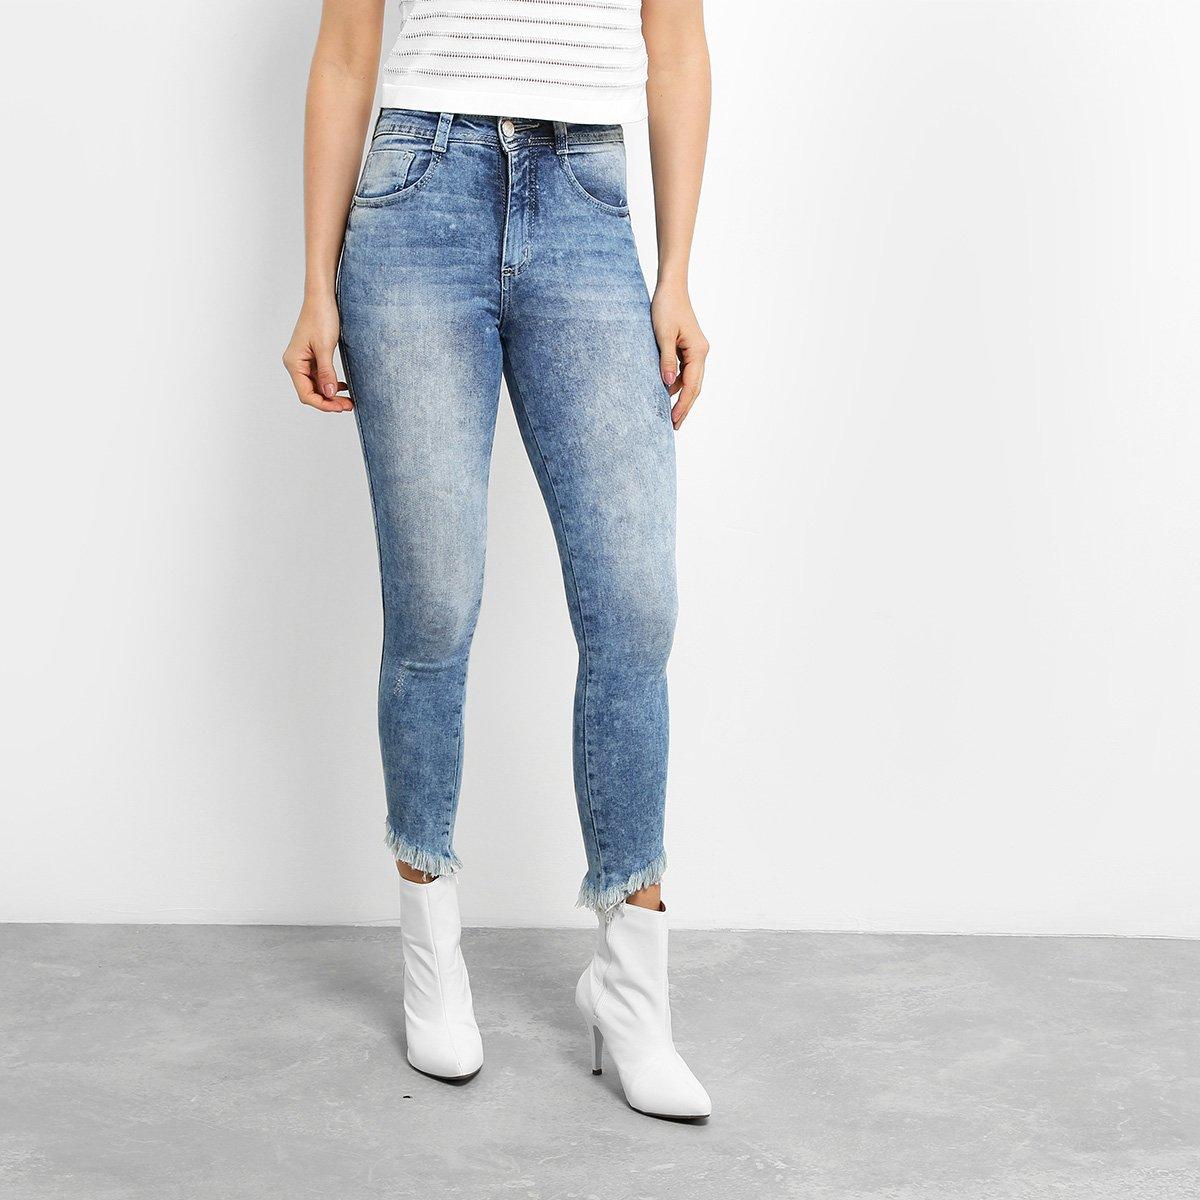 cb7f608a9 Calça Jeans Skinny Biotipo Cigarrete Barra Irregular Cintura Alta Feminina  | Zattini